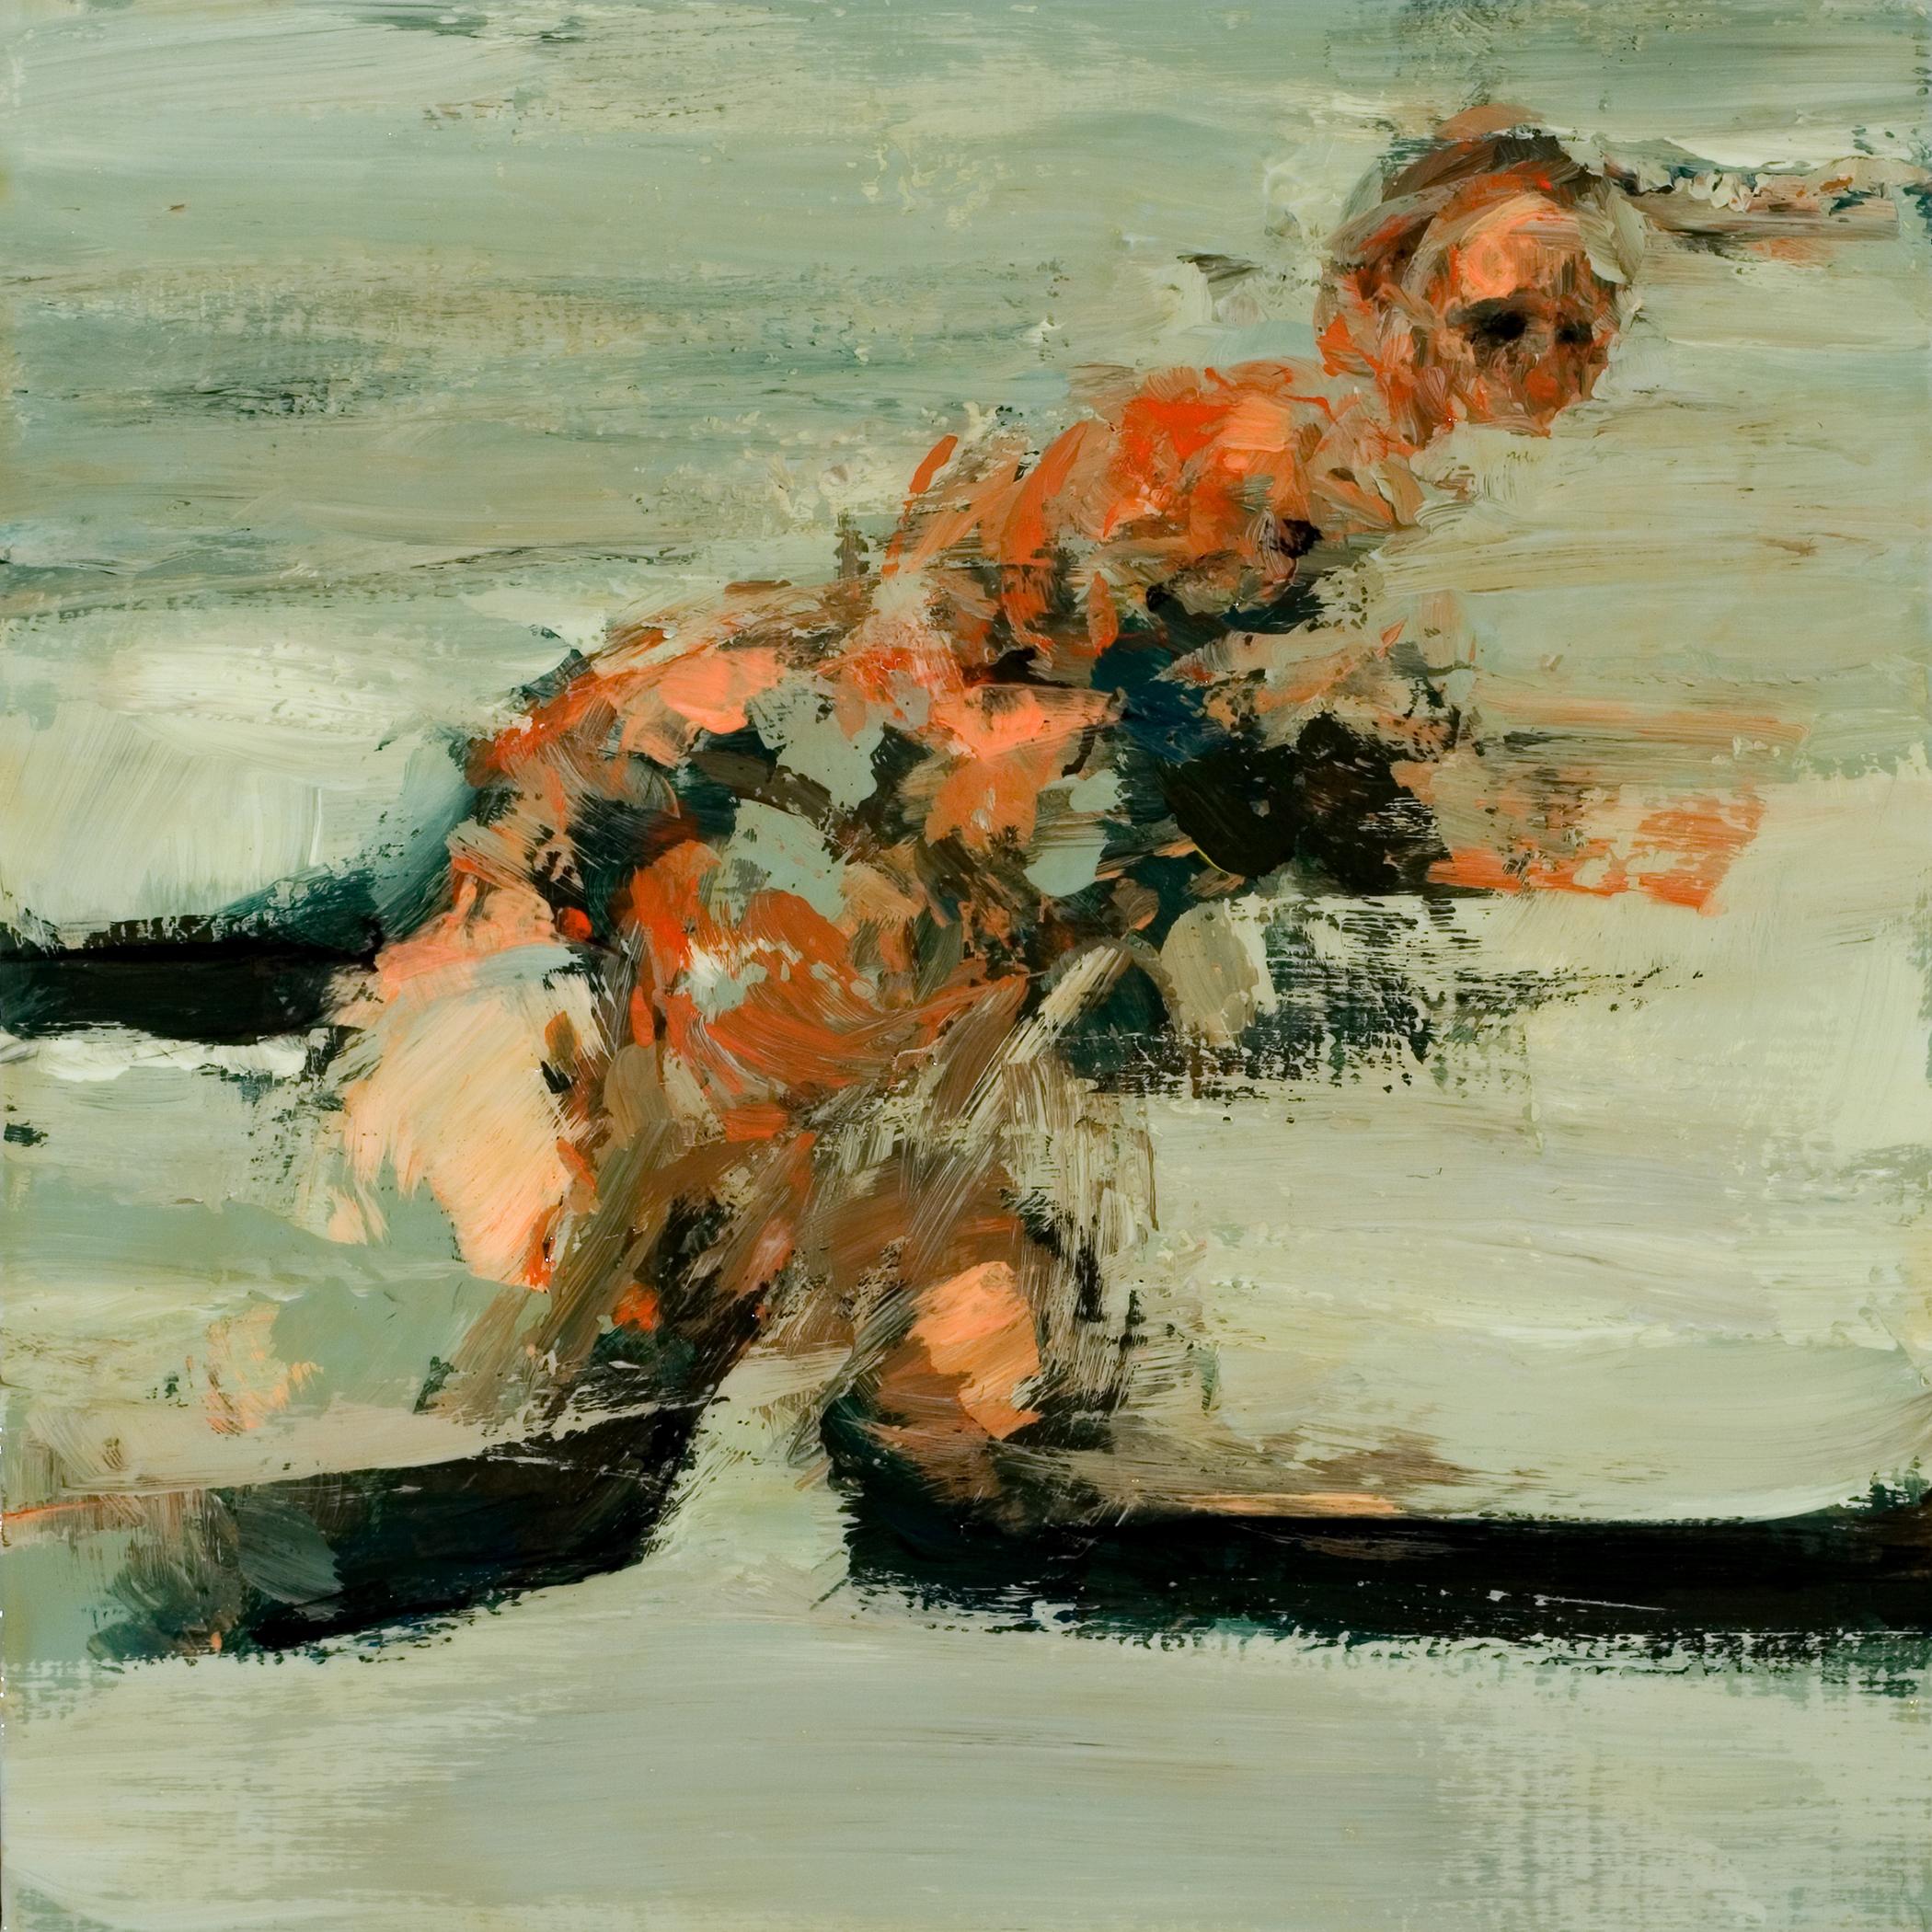 "Rough, acrylic & oil on board, 8"" x 8"" x 2"", 2010"